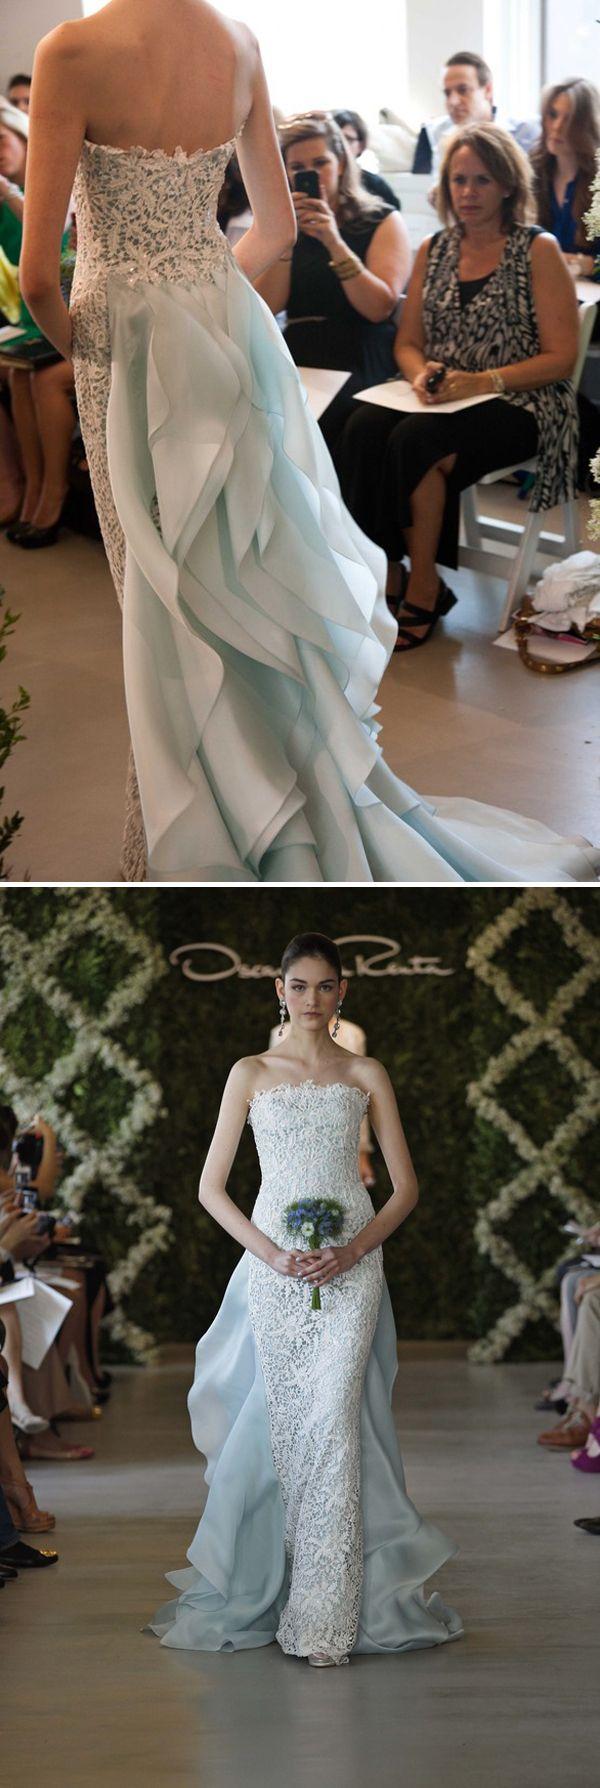 Dreamy blue wedding dress from Oscar de la Renta Spring 2013 Bridal Collection